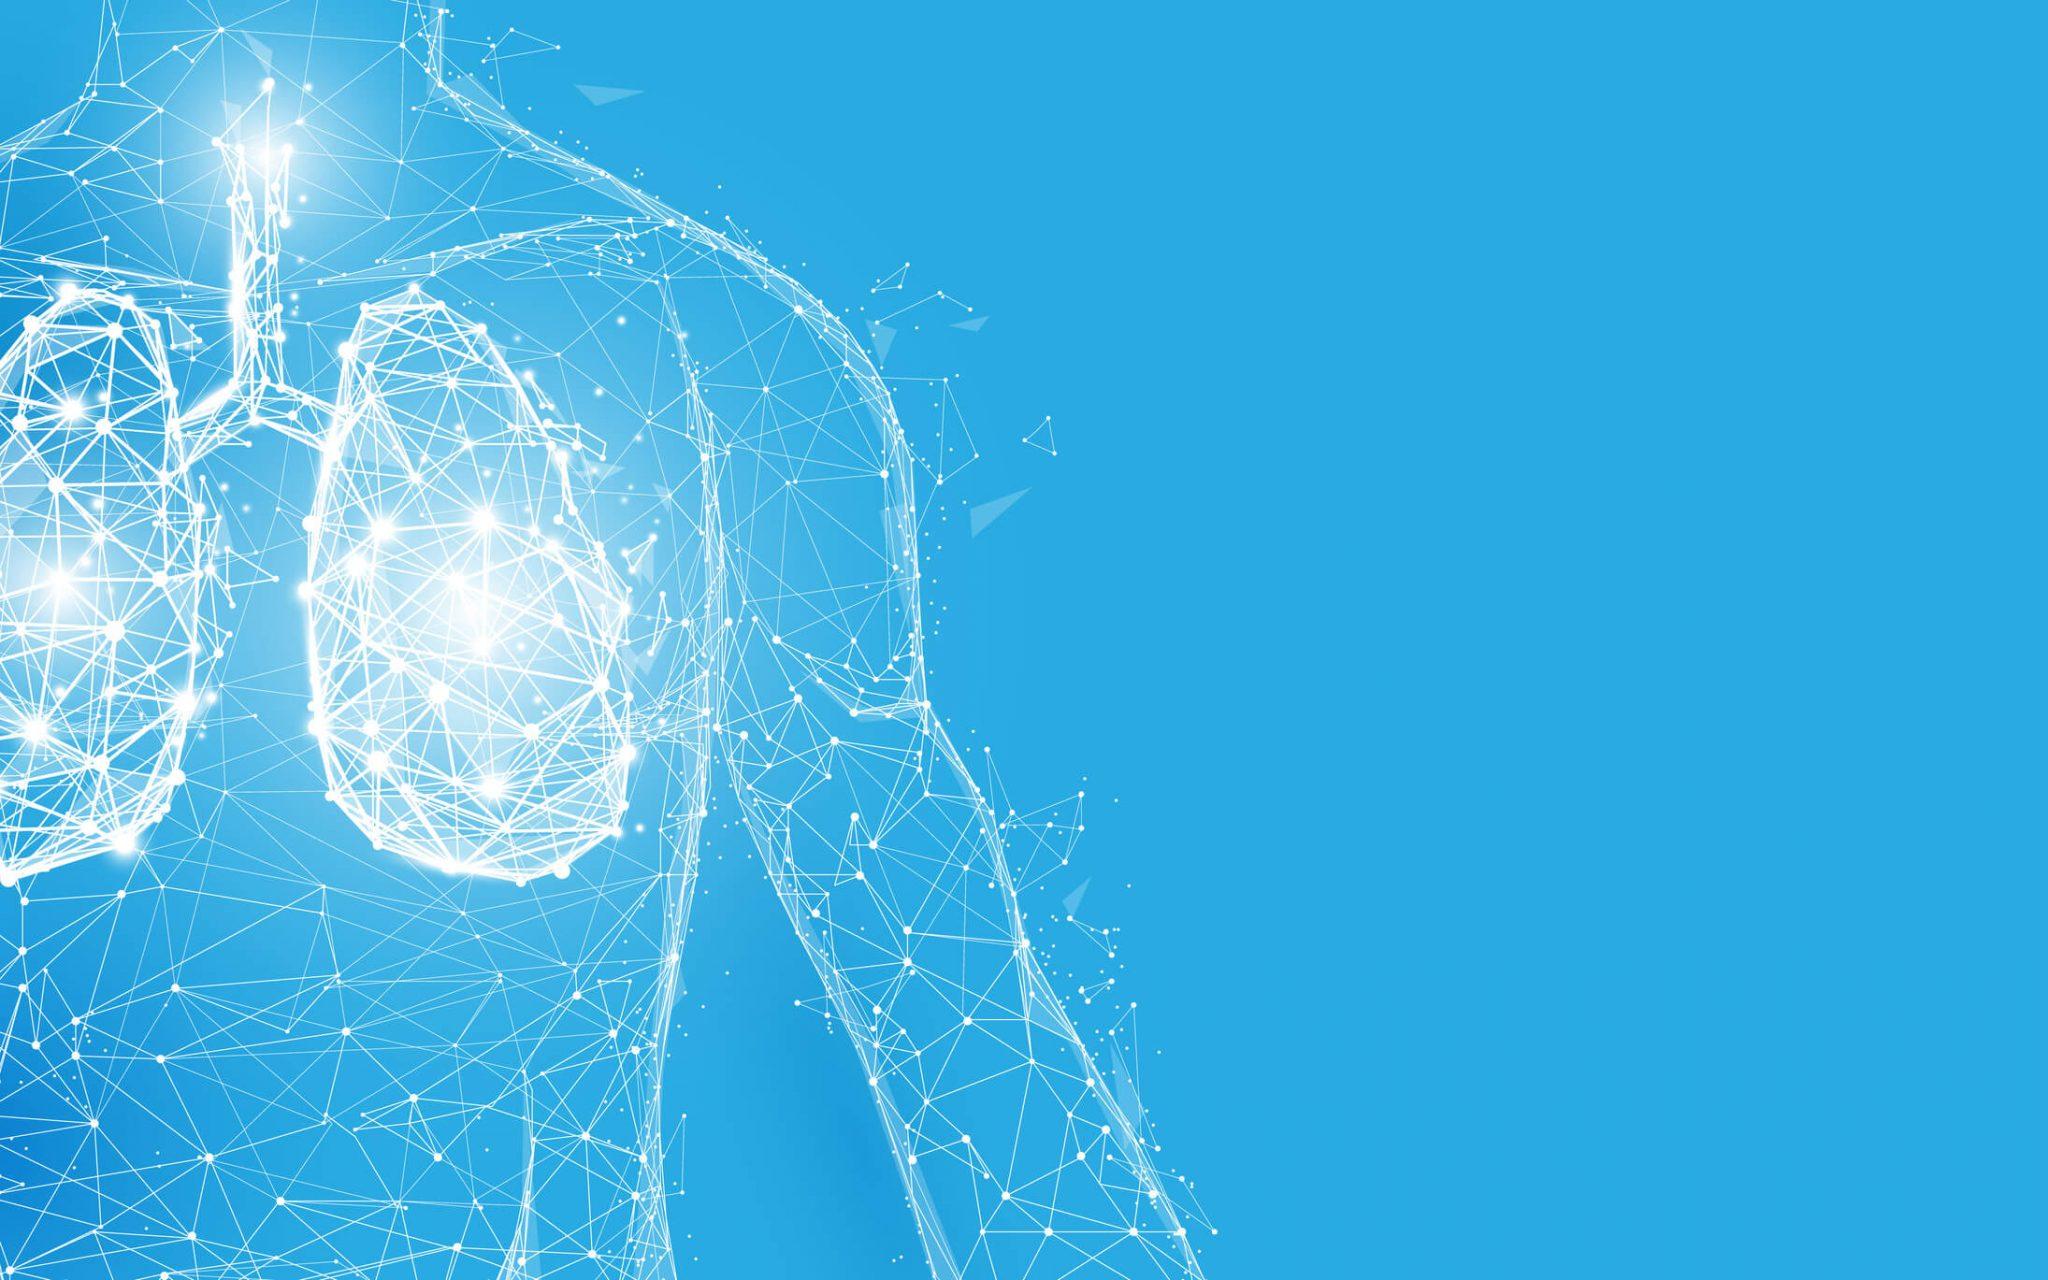 Oxygen supplementation getting oxygen into lungs